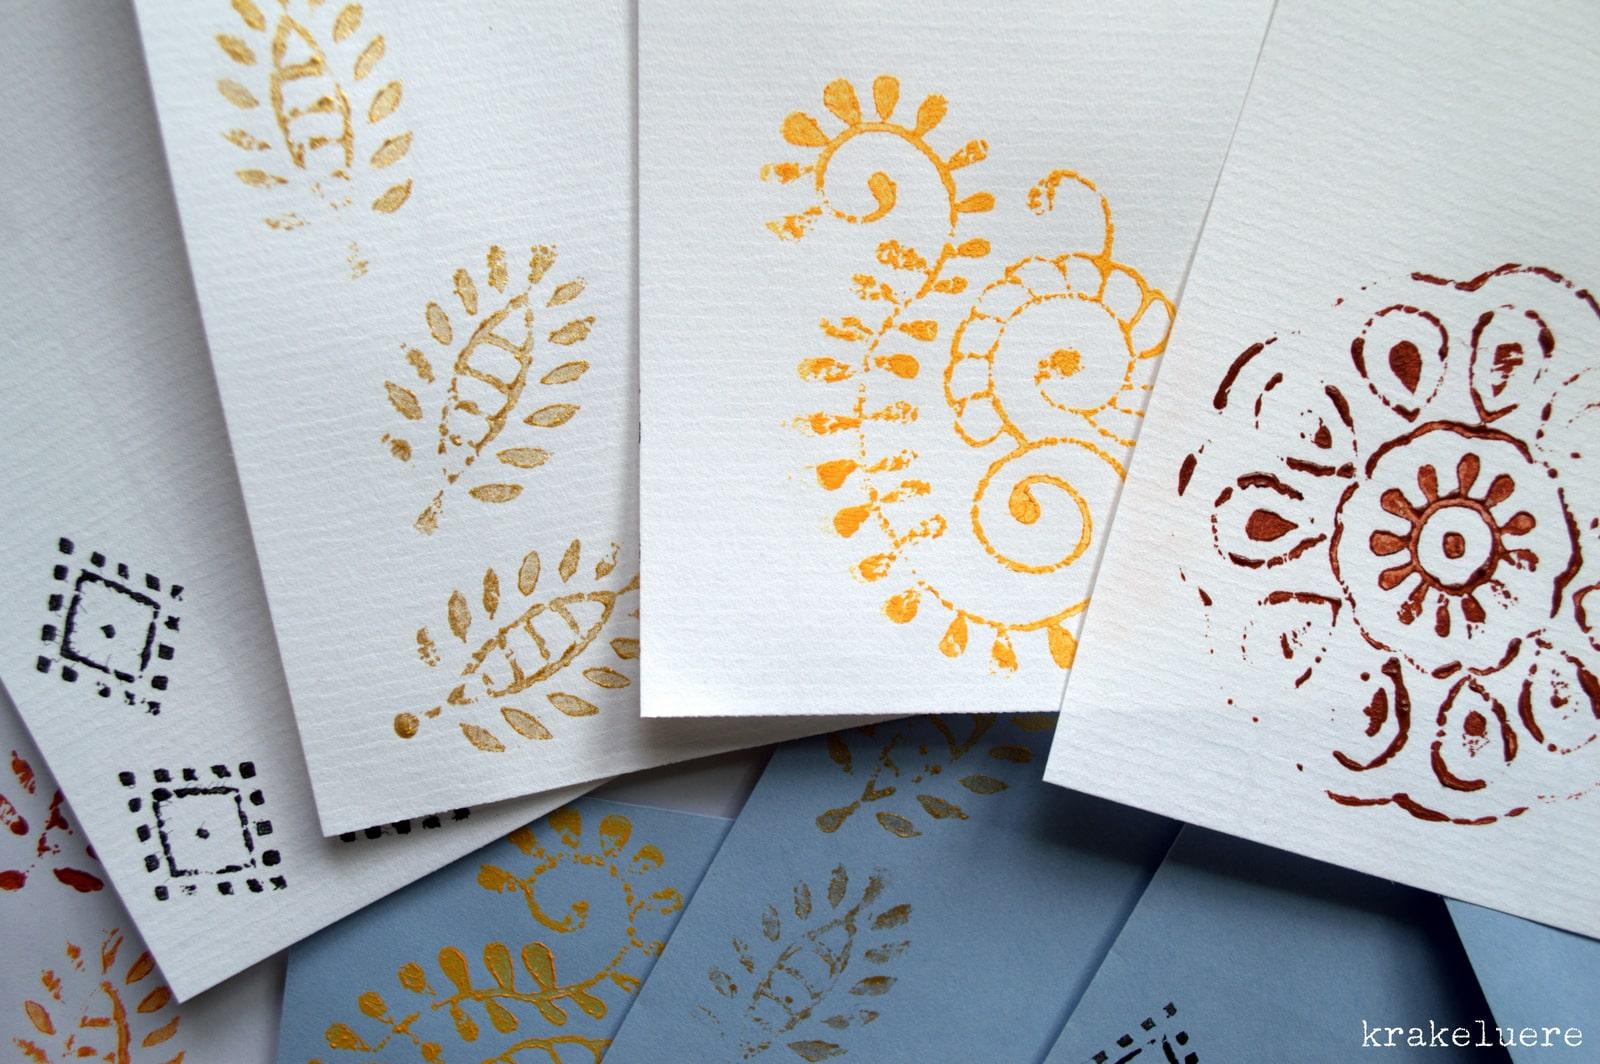 kalamkari briefpapier handmade kultur. Black Bedroom Furniture Sets. Home Design Ideas